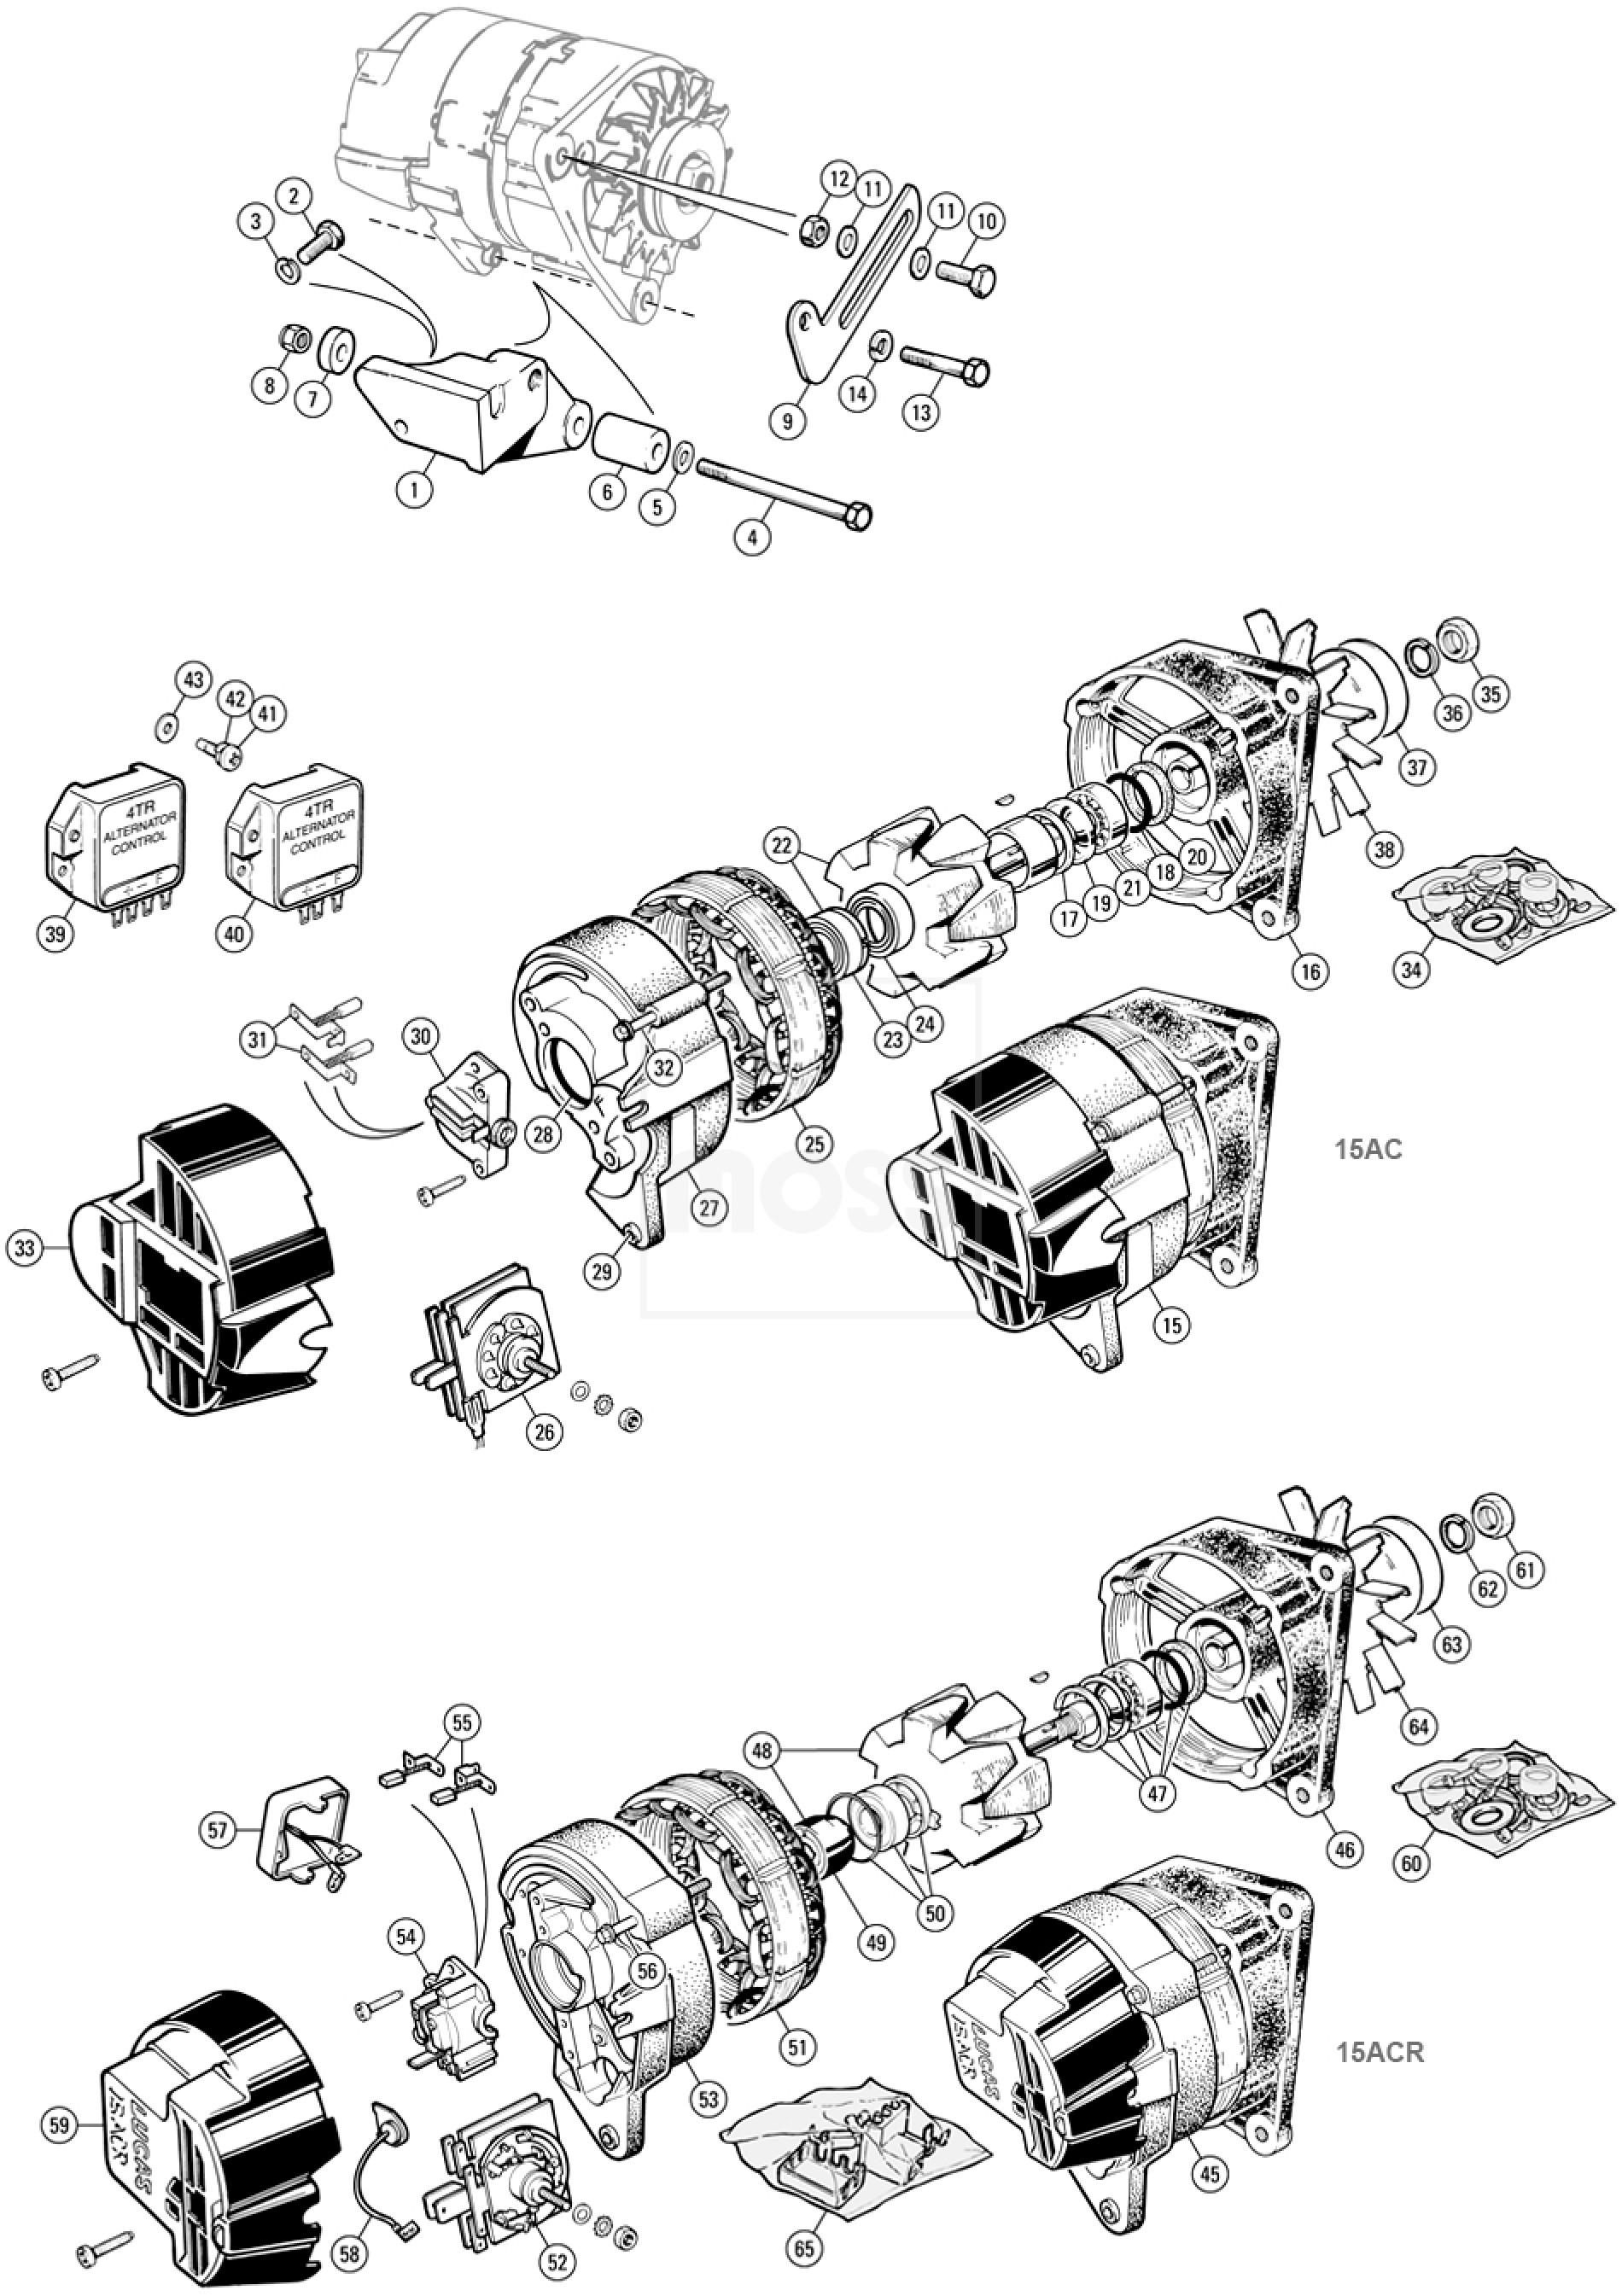 alternators  u0026 fittings  lucas 15ac  15acr